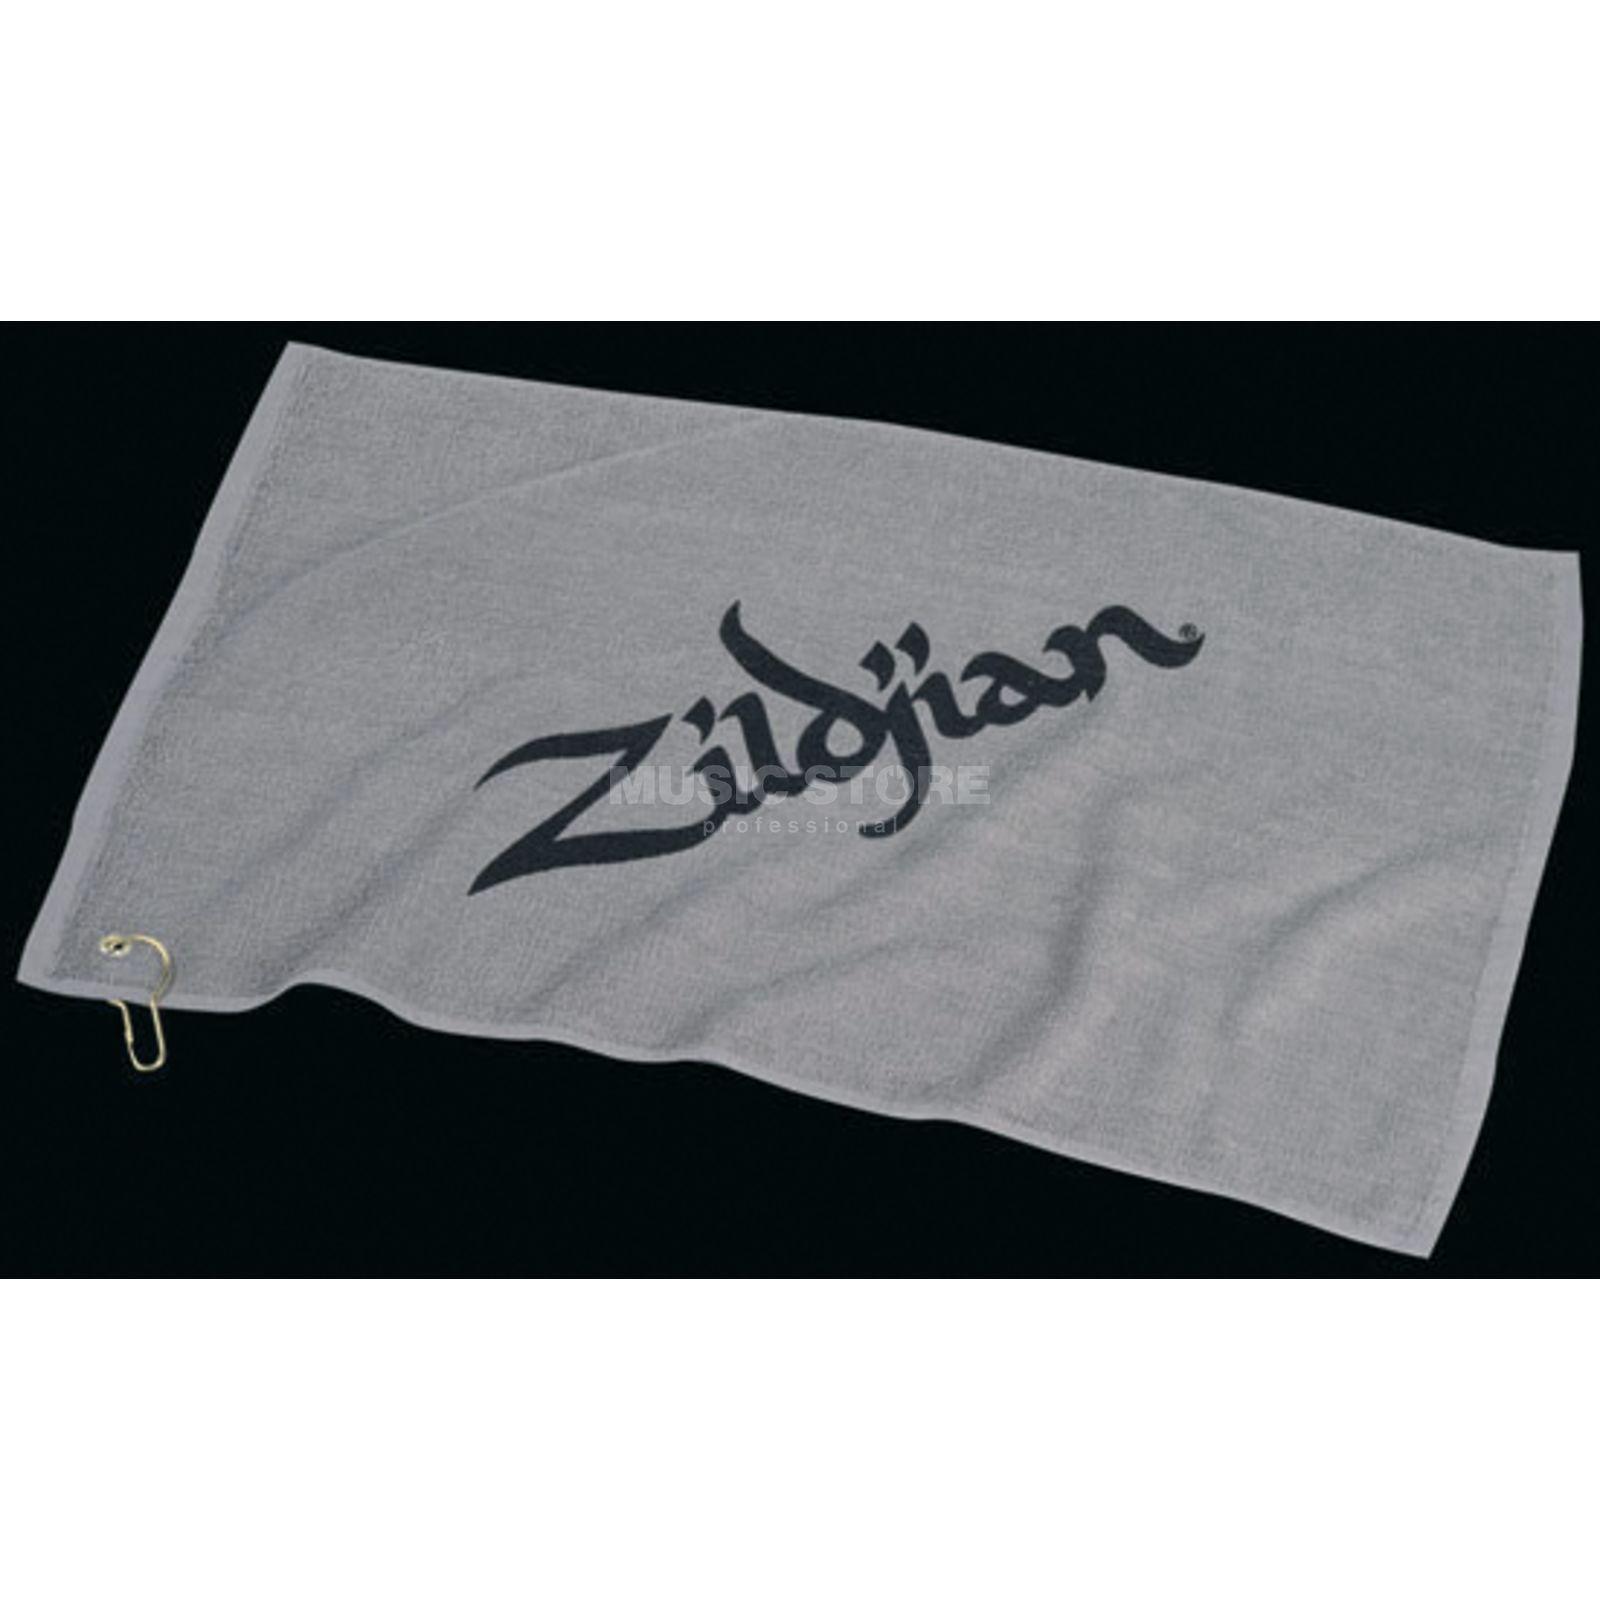 zildjian handtuch towel. Black Bedroom Furniture Sets. Home Design Ideas